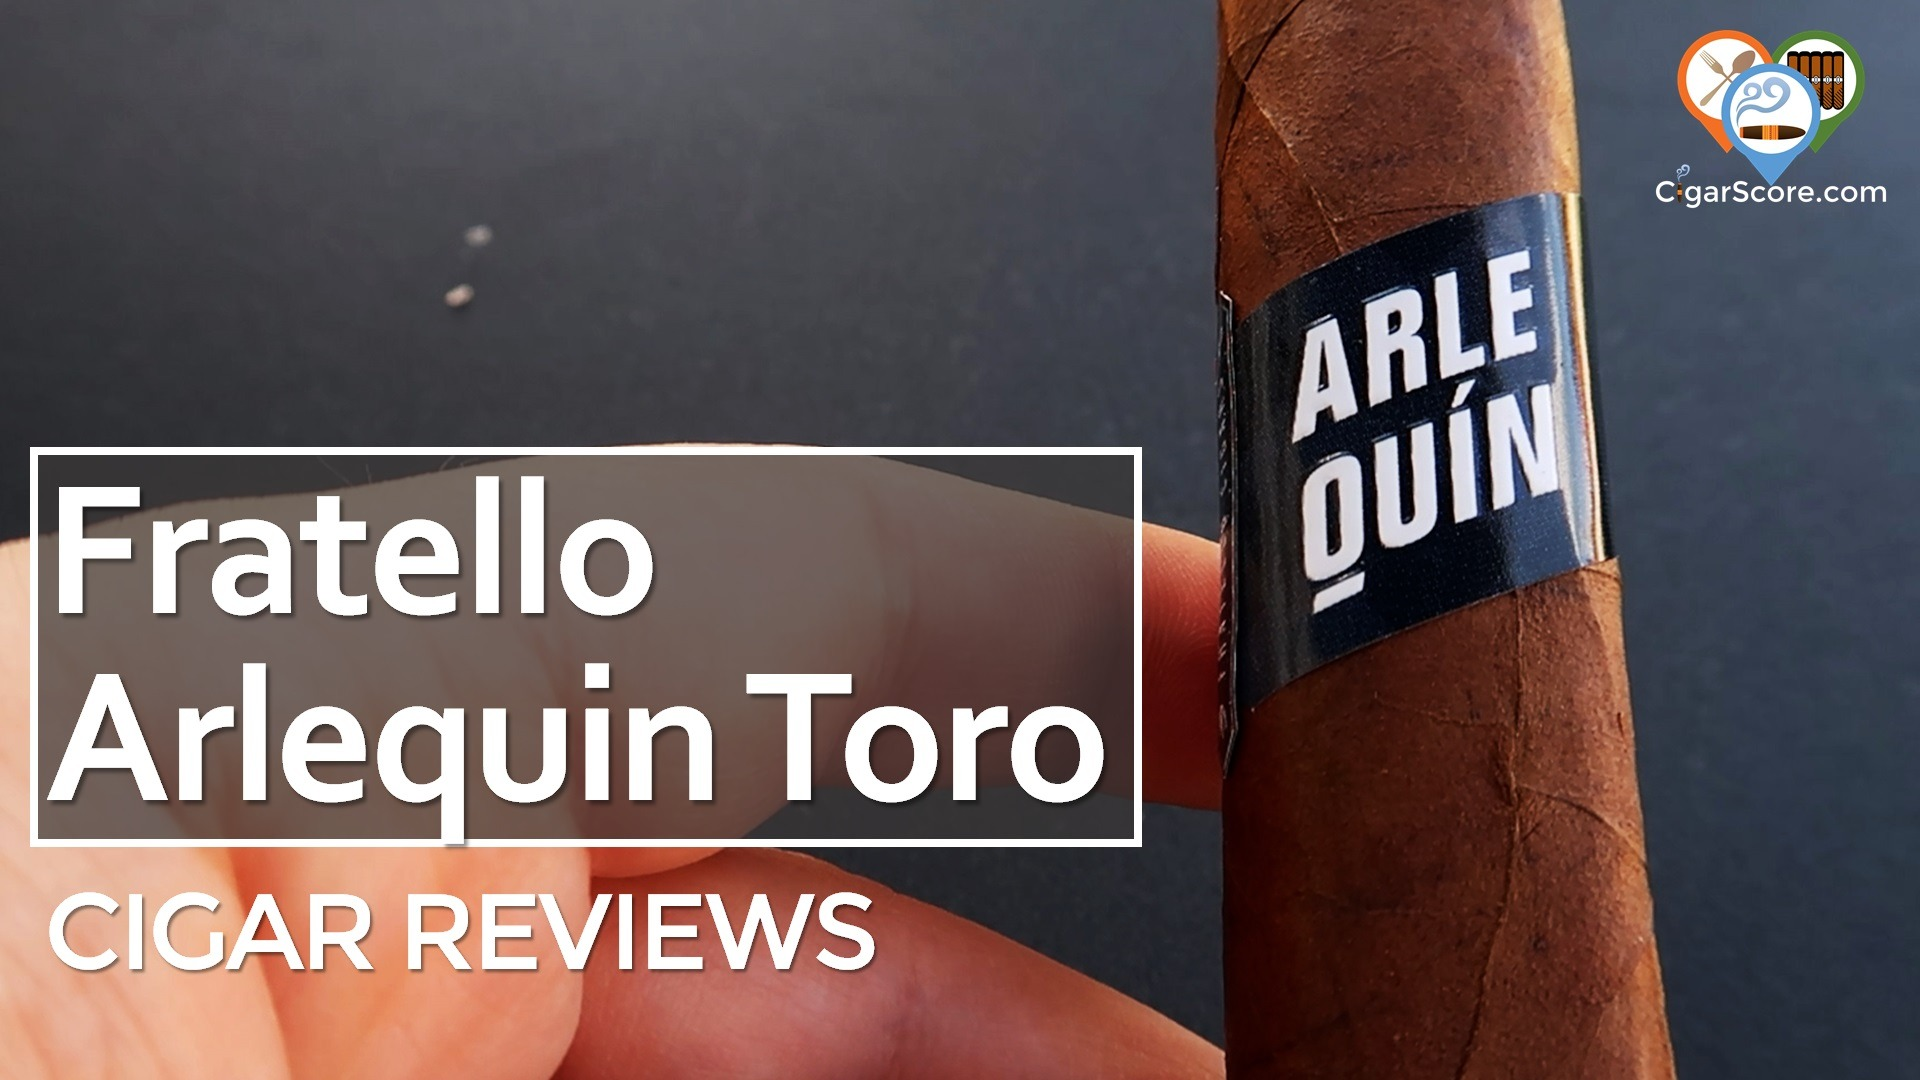 Cigar Review Fratello Arlequin Toro